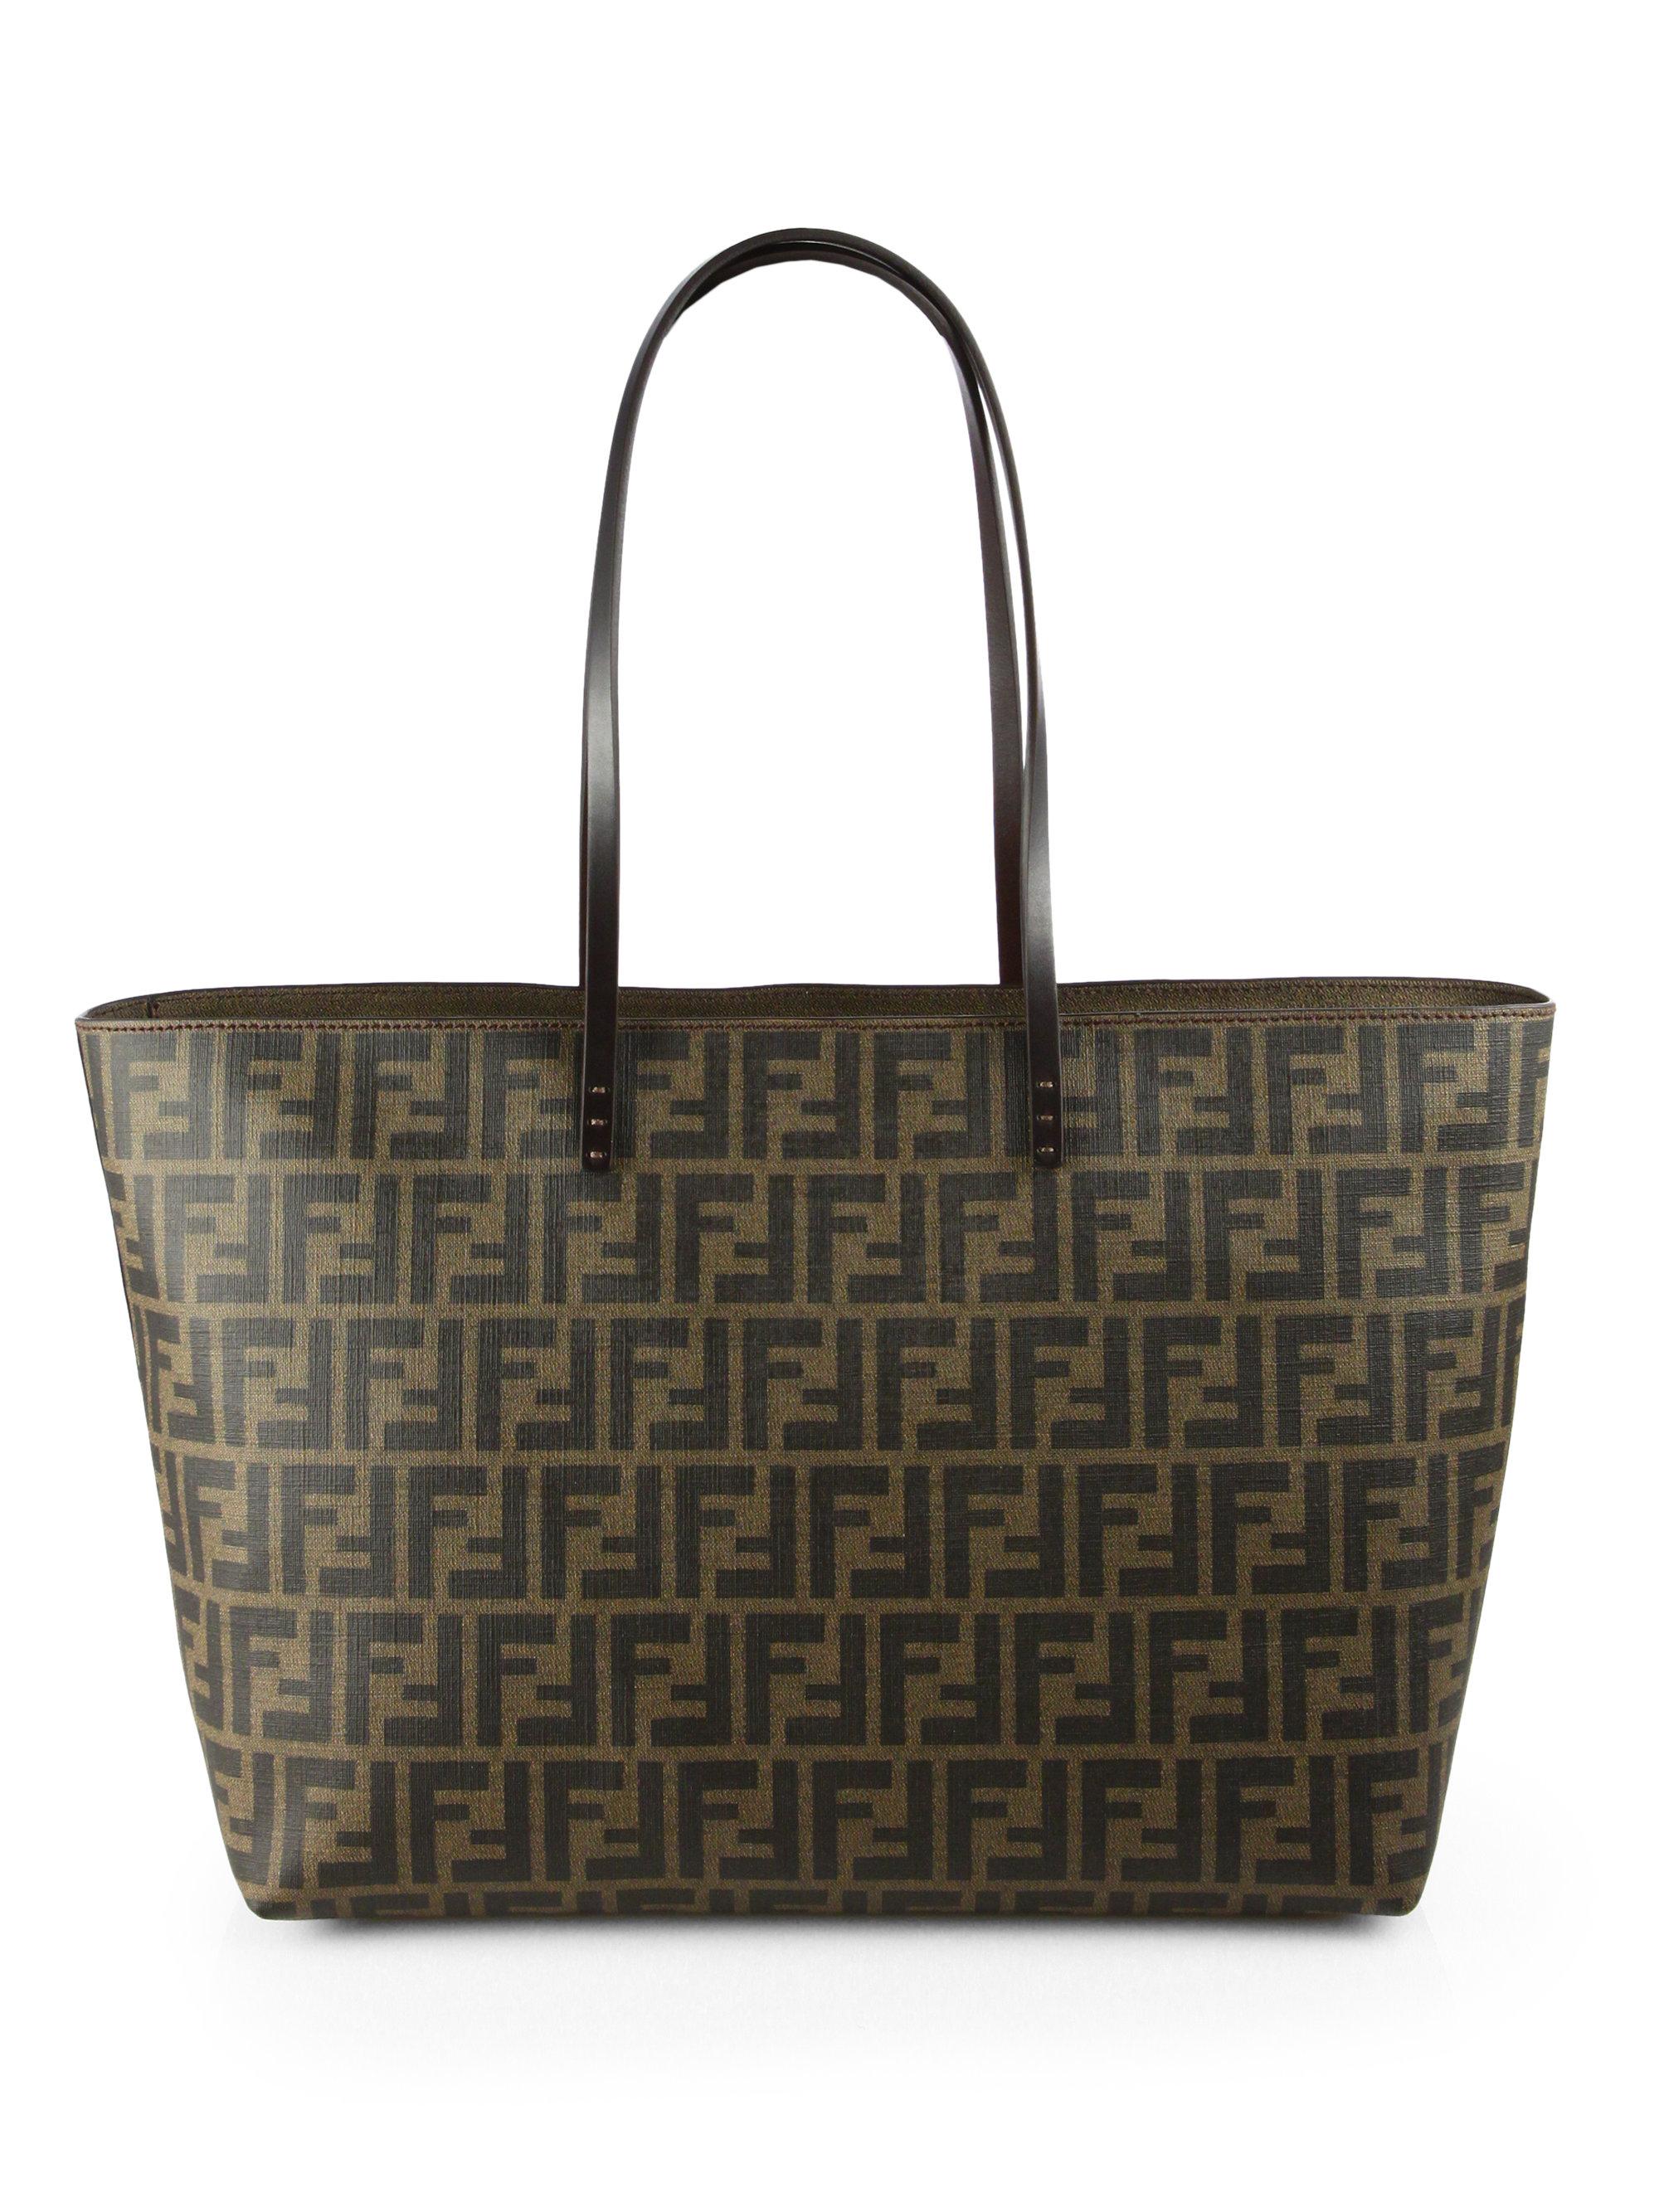 Fendi Matrioska Medium Shoulder Bag in Brown - Lyst 6435601112f9a